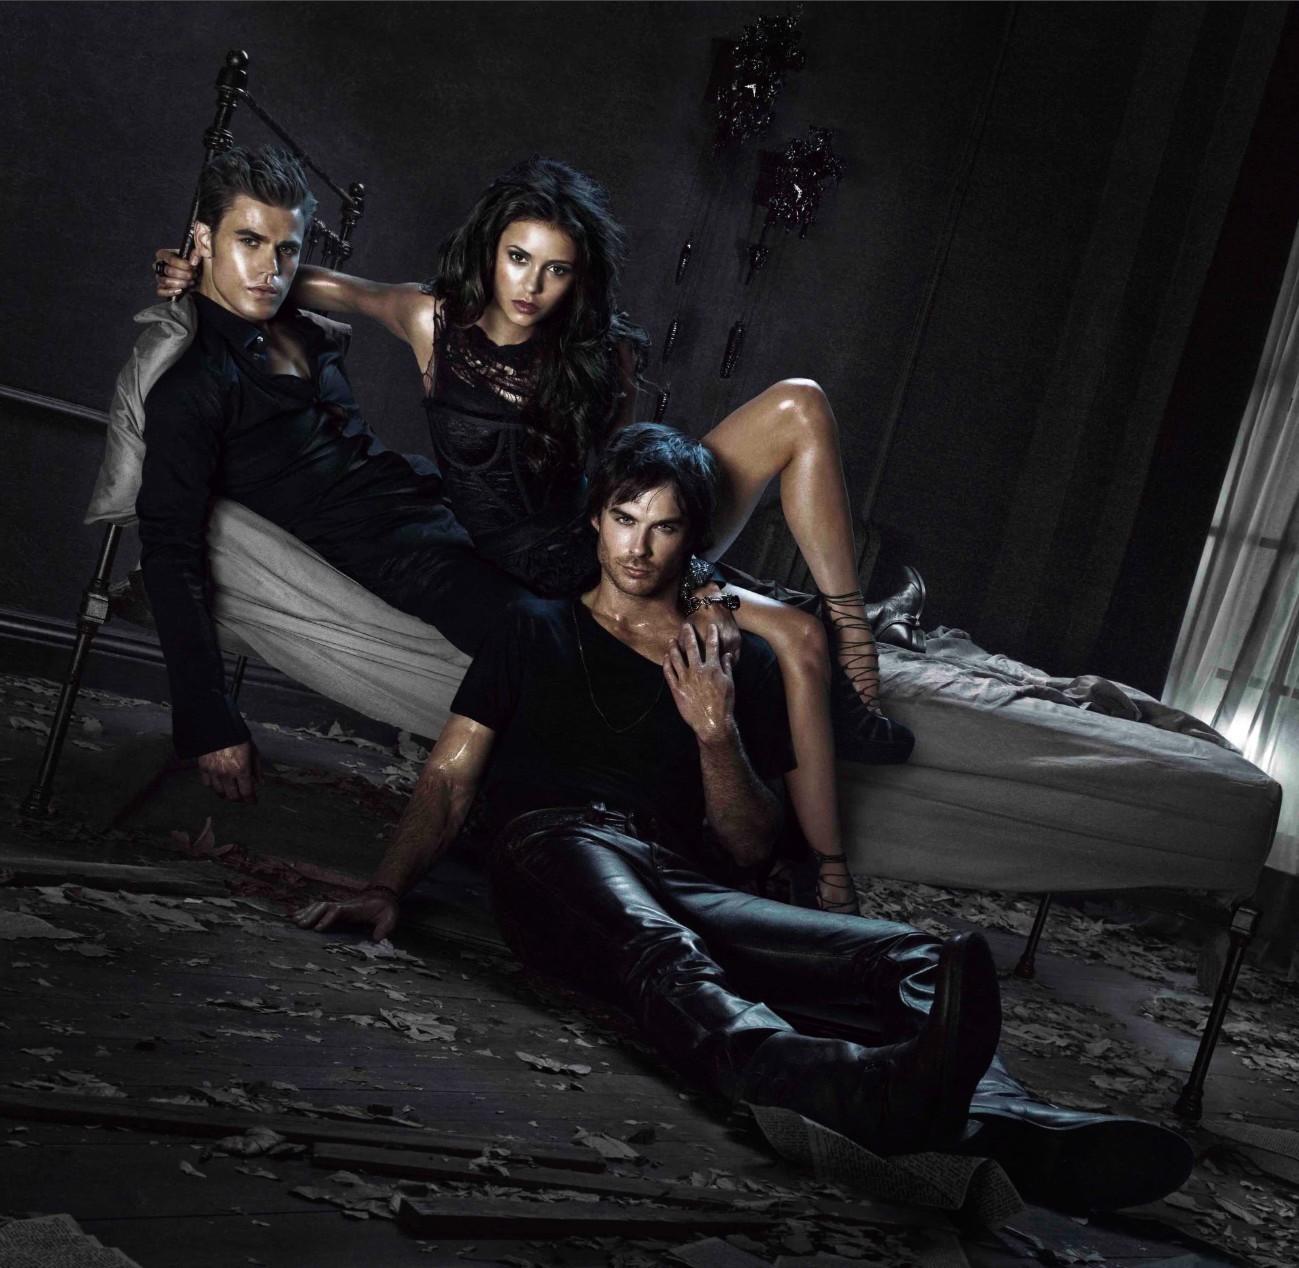 http://1.bp.blogspot.com/-obpM8RVldVM/UEnhKhO2aZI/AAAAAAAAASs/EXK_yd1nUZY/s1600/The-Vampire-Diaries-Season-2-Promo-ian-somerhalder-16407576-1299-1268.jpg